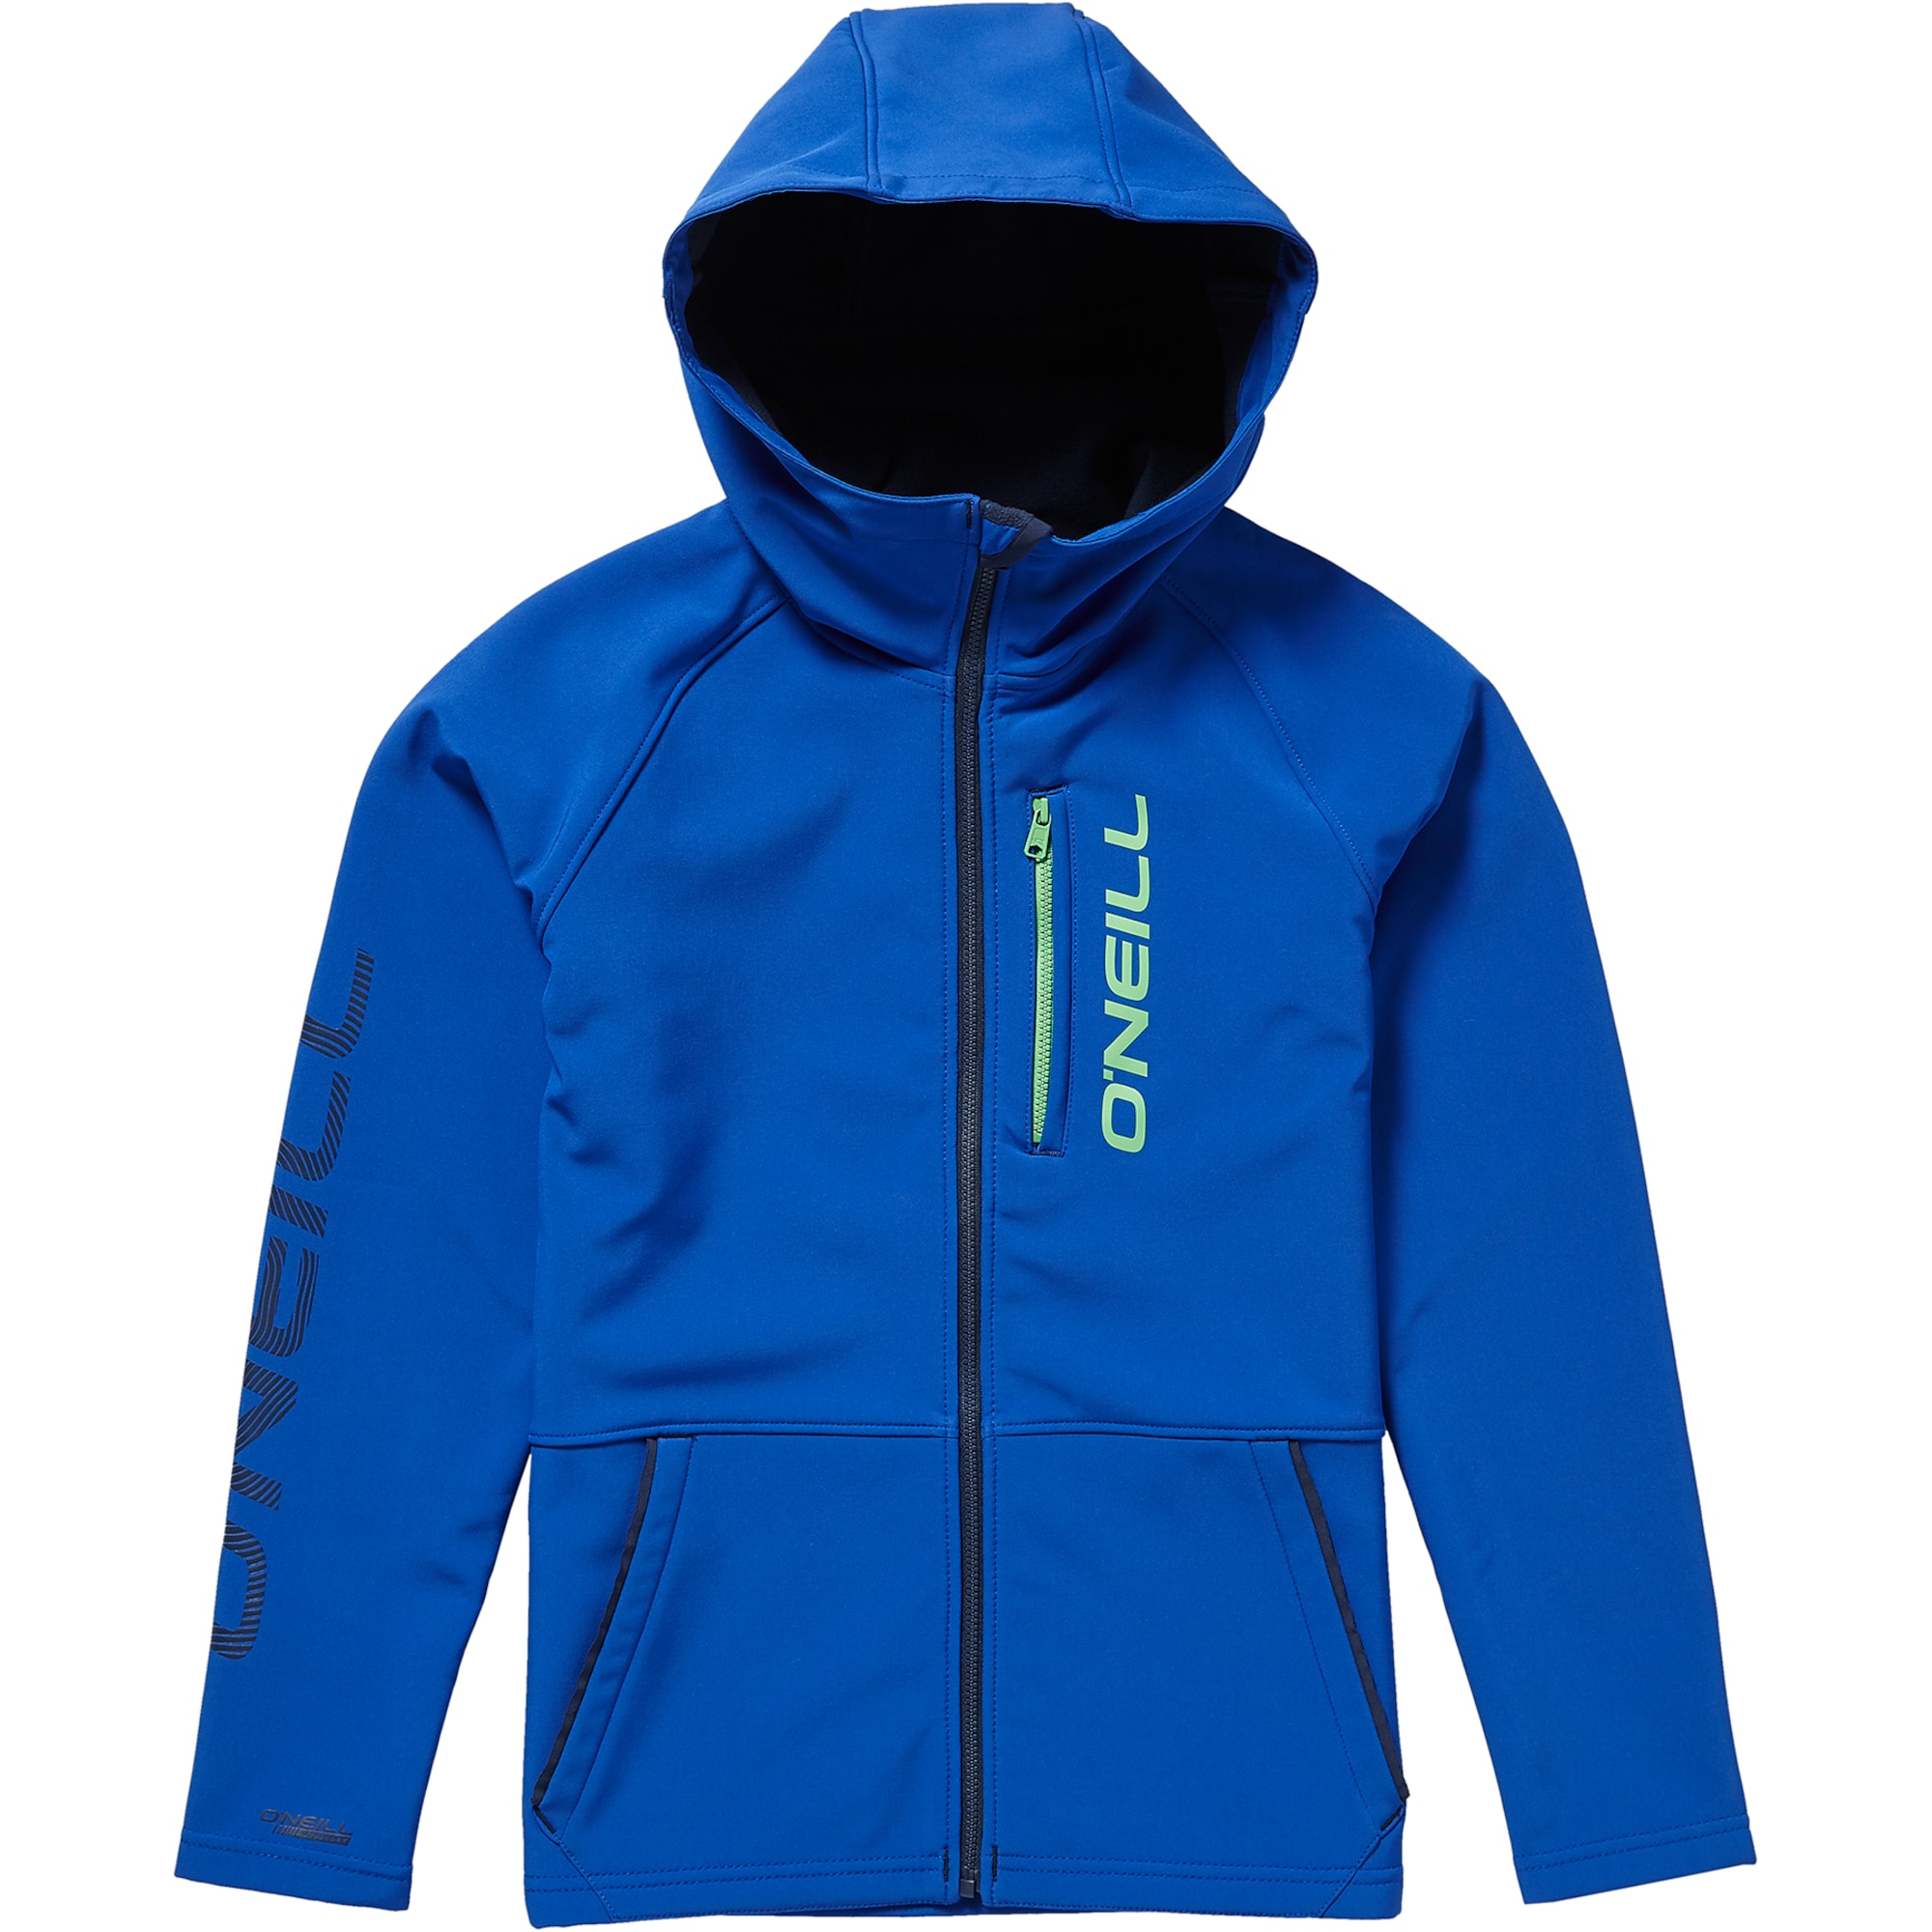 ONEILL Funkční bunda PB SOFTSHELL modrá O'NEILL